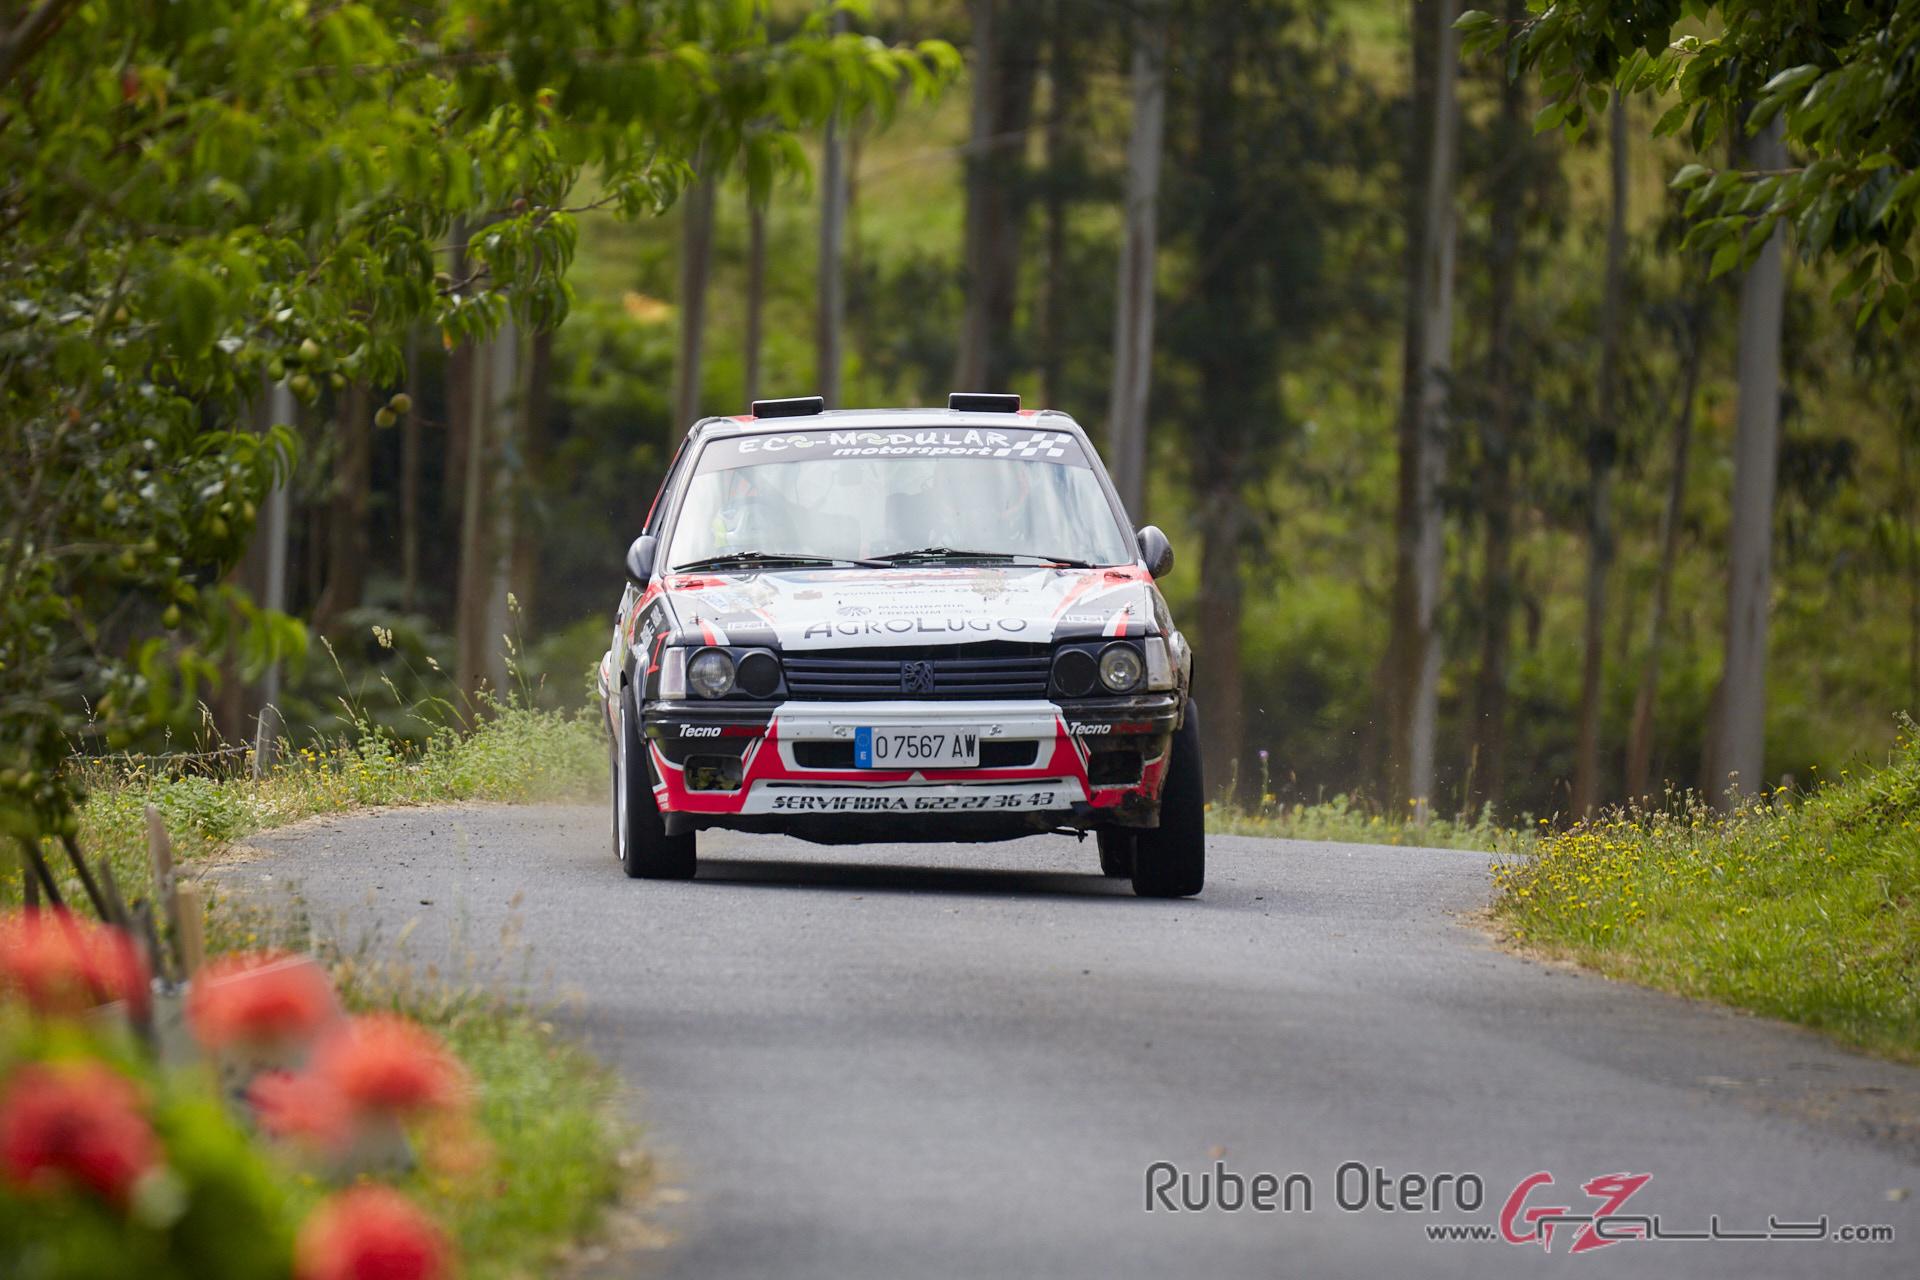 Rally de Ferrol 2019 - Ruben Otero